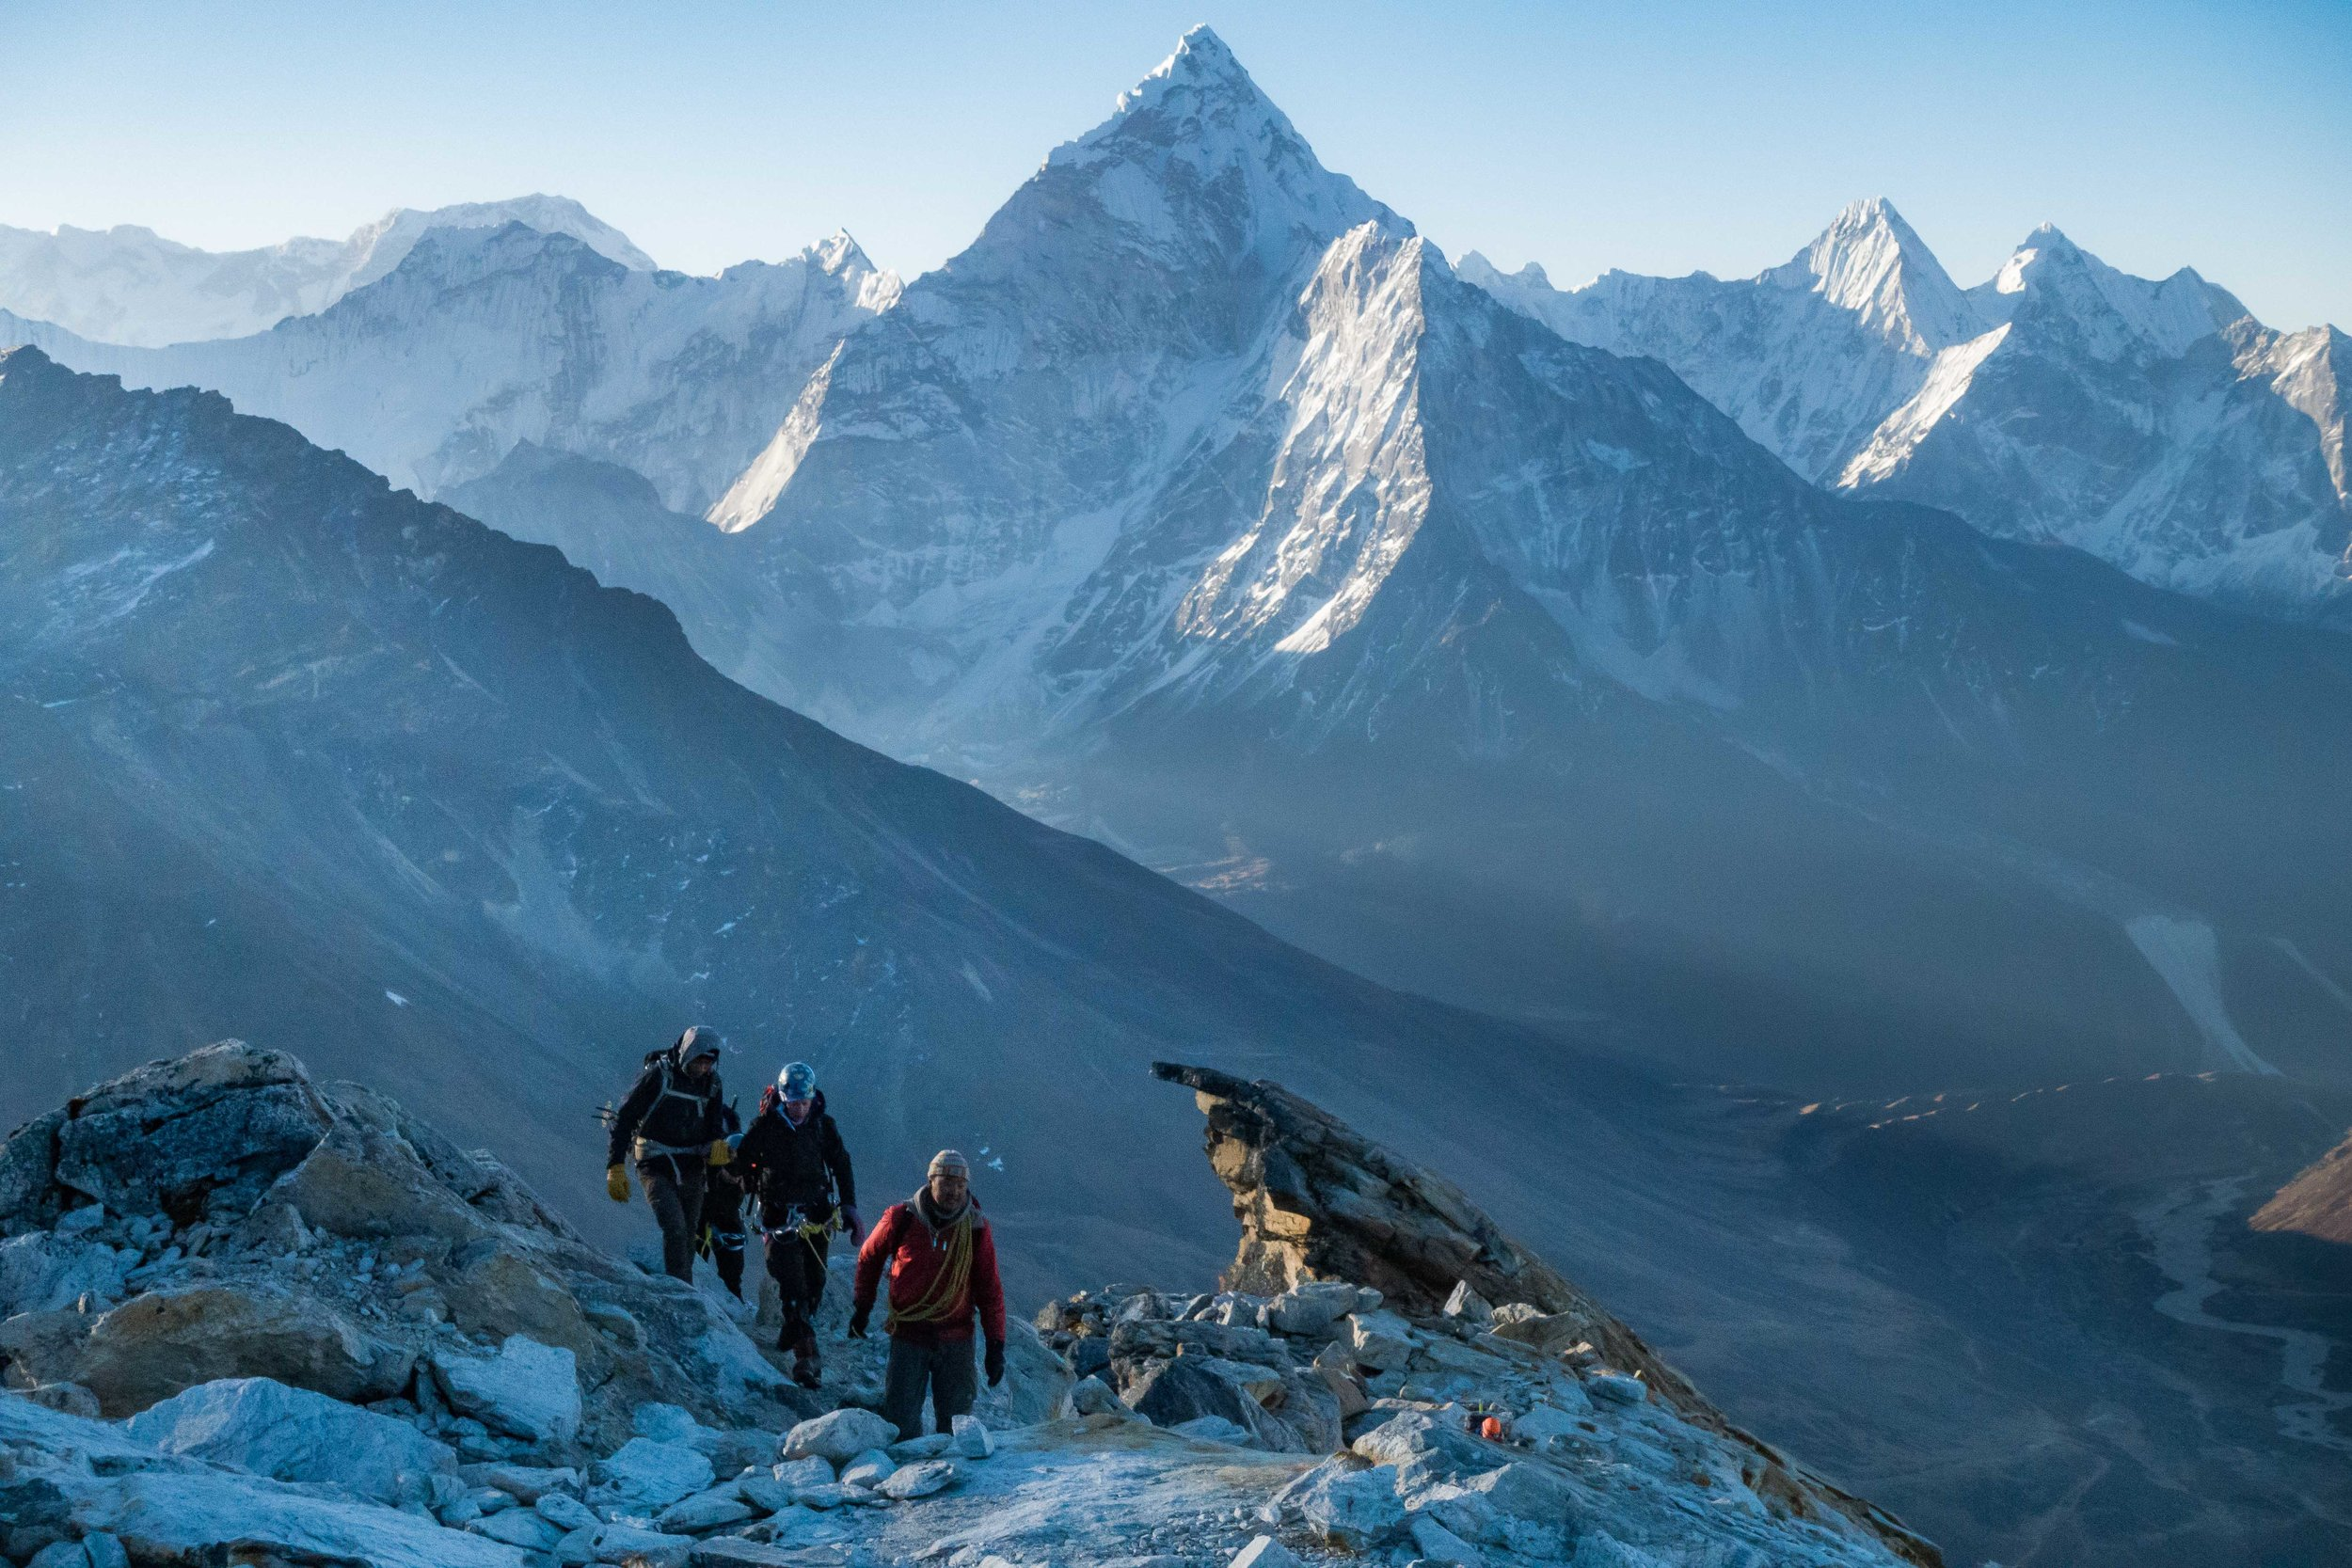 Walking the ridge to crampon point on Lobuche